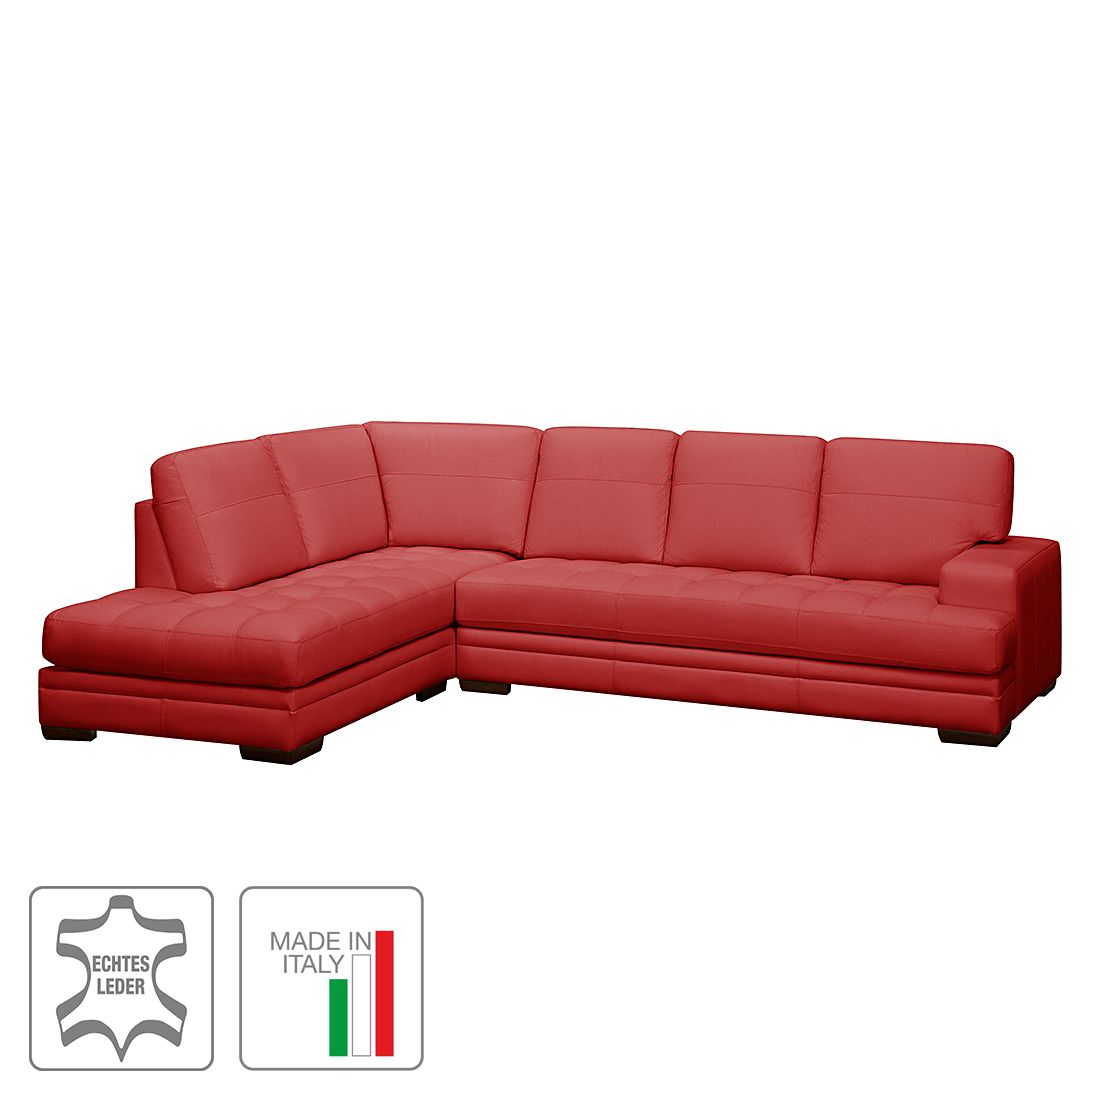 Ecksofa Trapuntato – Echtleder – Longchair/Ottomane davorstehend links – Rot, Trend Italiano kaufen